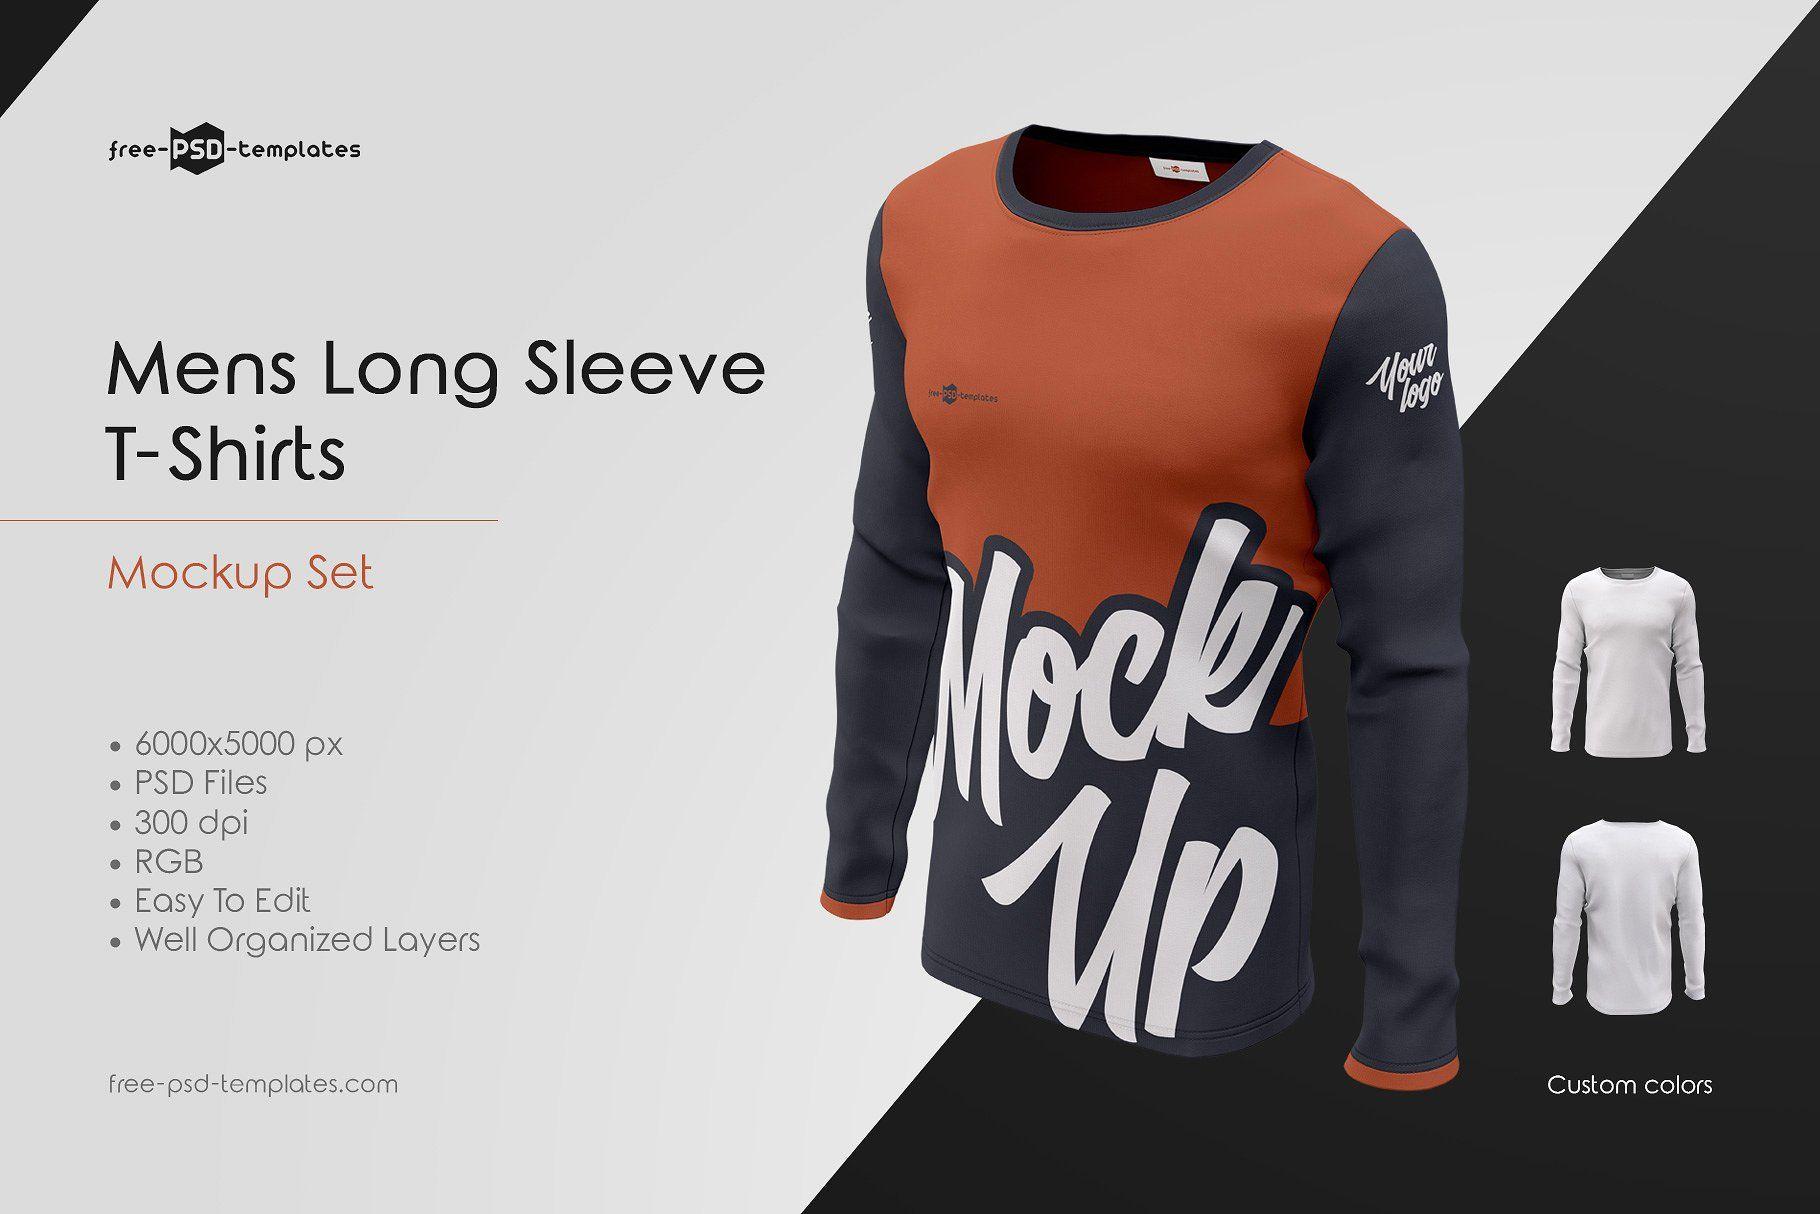 Mens Long Sleeve T Shirts Mockup Set Shirt Mockup Men S Long Sleeve T Shirt Long Sleeve Tshirt Long sleeve shirt template psd